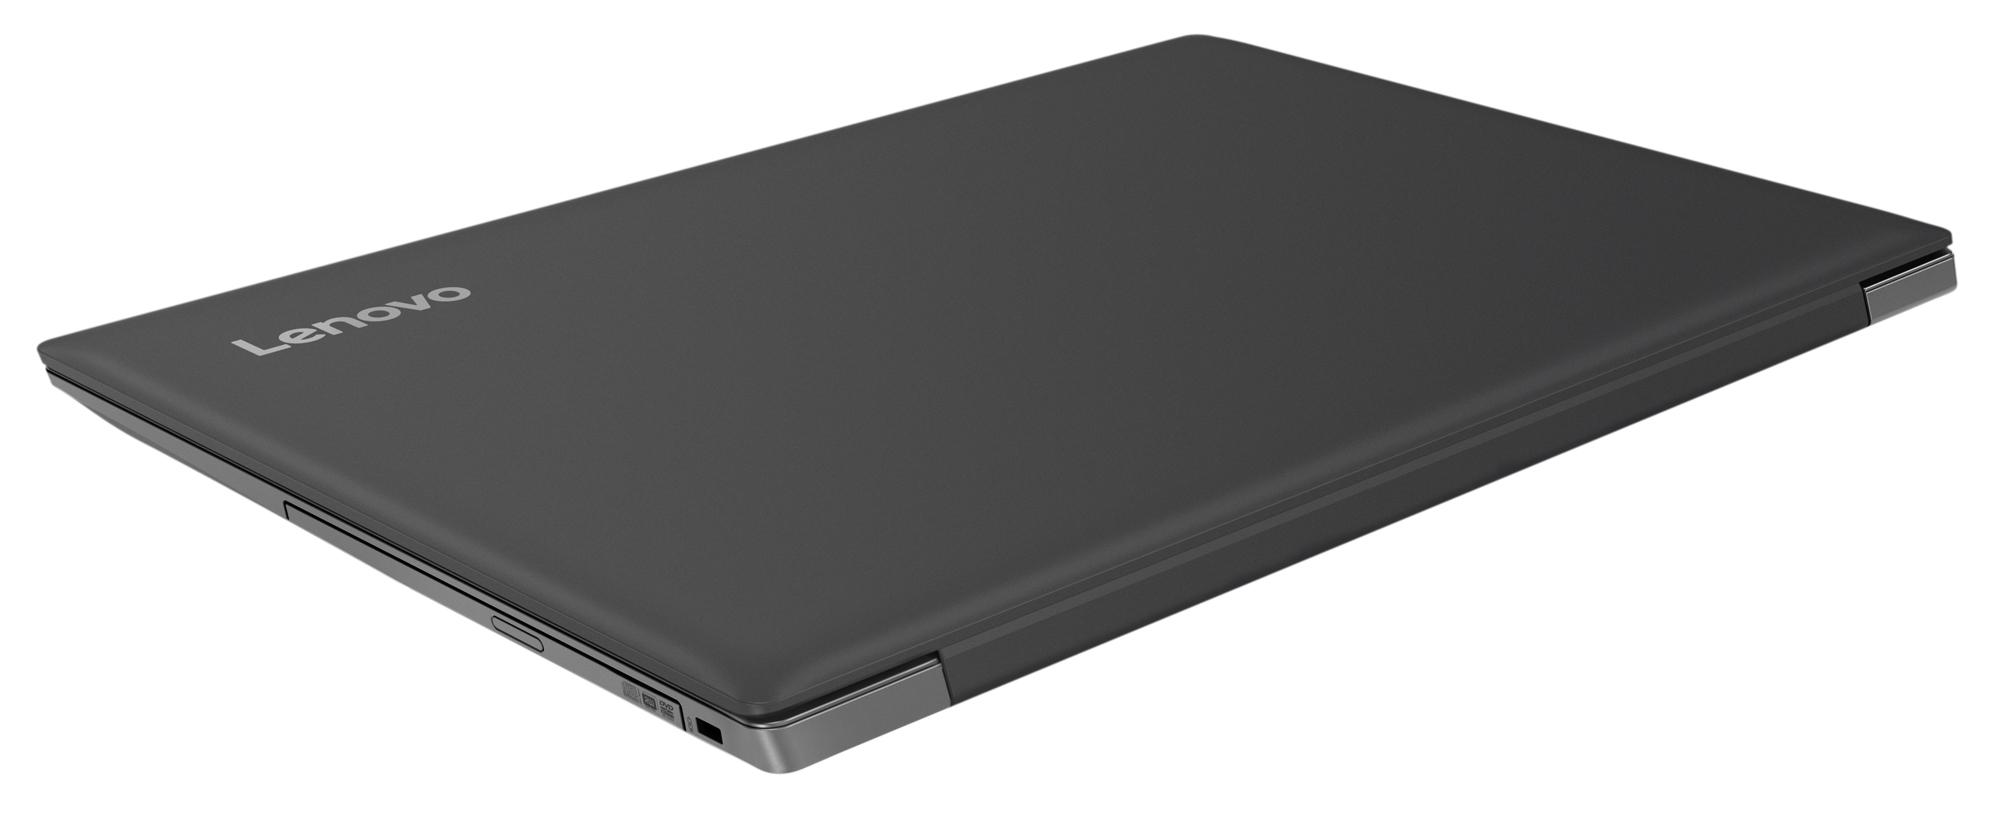 Фото  Ноутбук Lenovo ideapad 330-15 Onyx Black (81D10091RA)